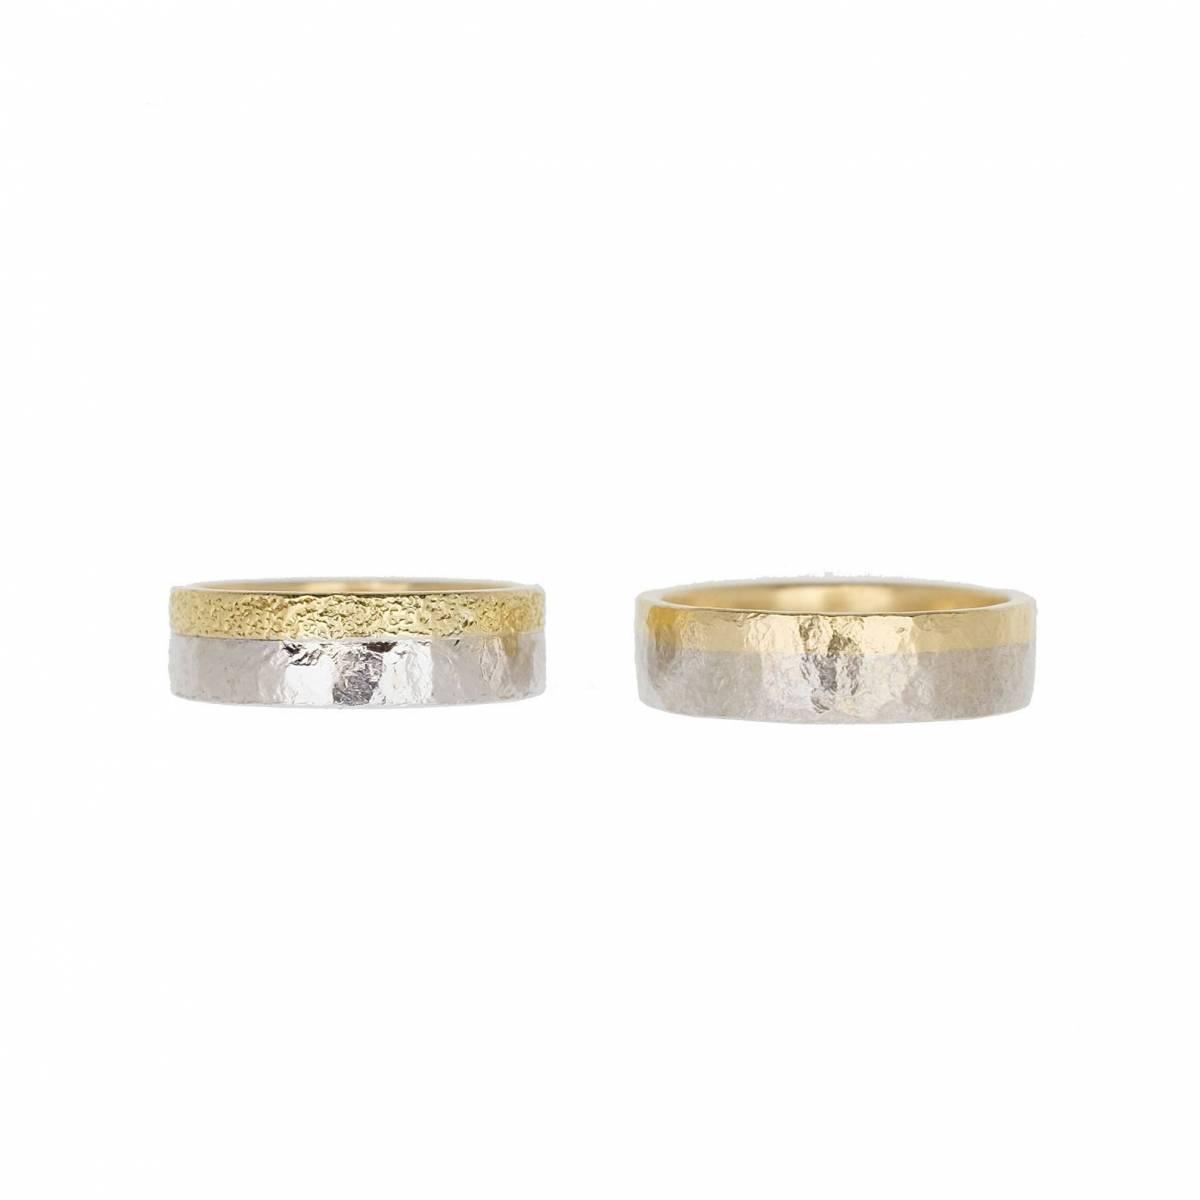 Jonas Maes Jewels - Juwelen - Bruidsjuwelen - Verlovingsring - Trouwring - House of Weddings - 12